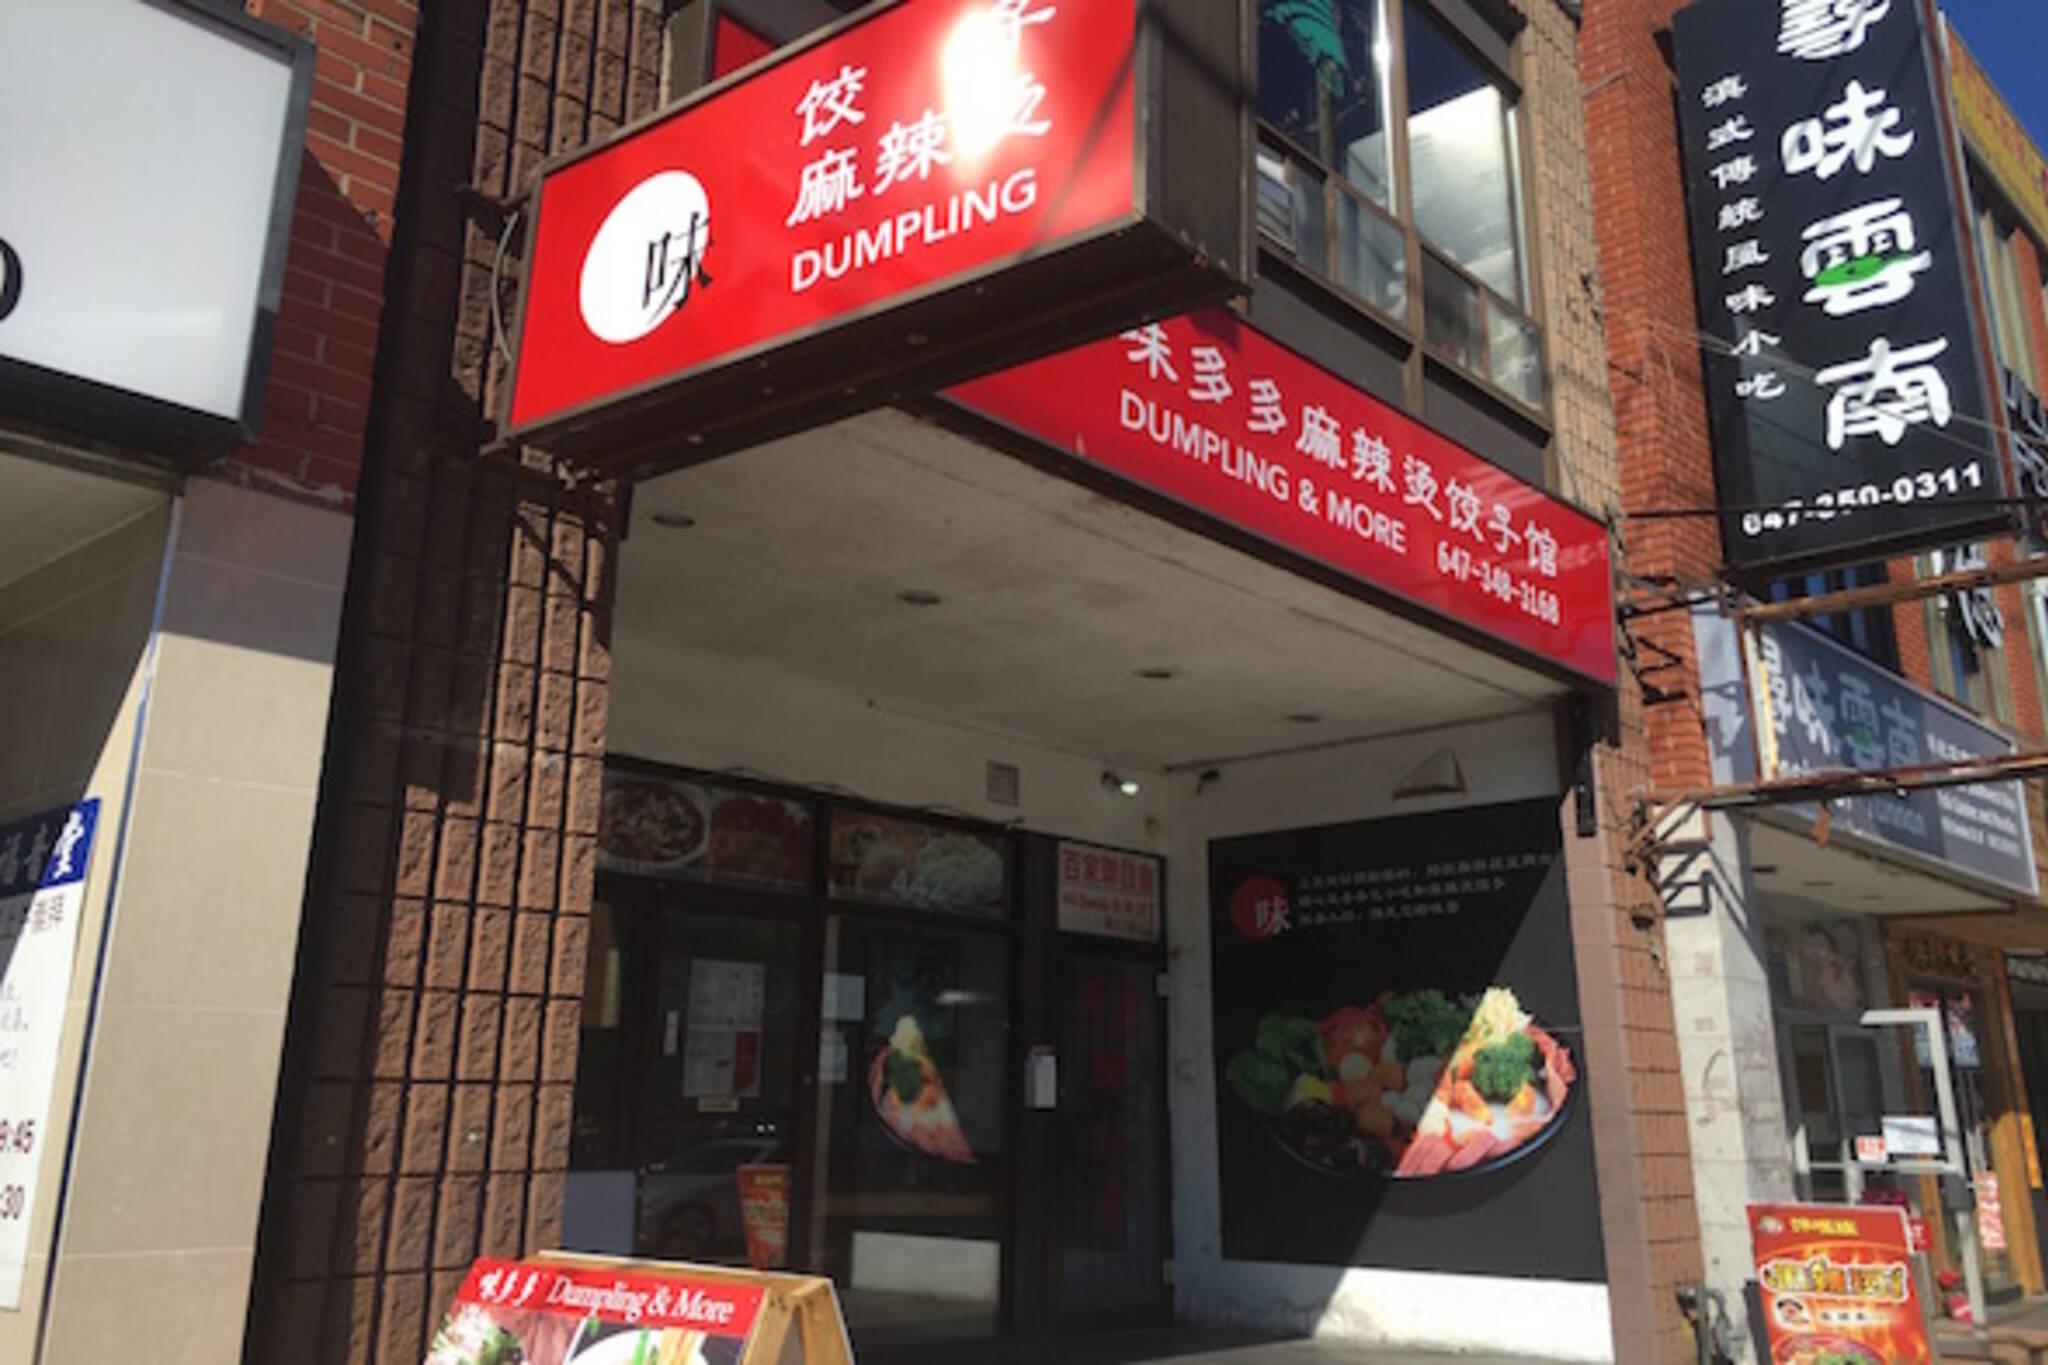 Dumpling More Toronto